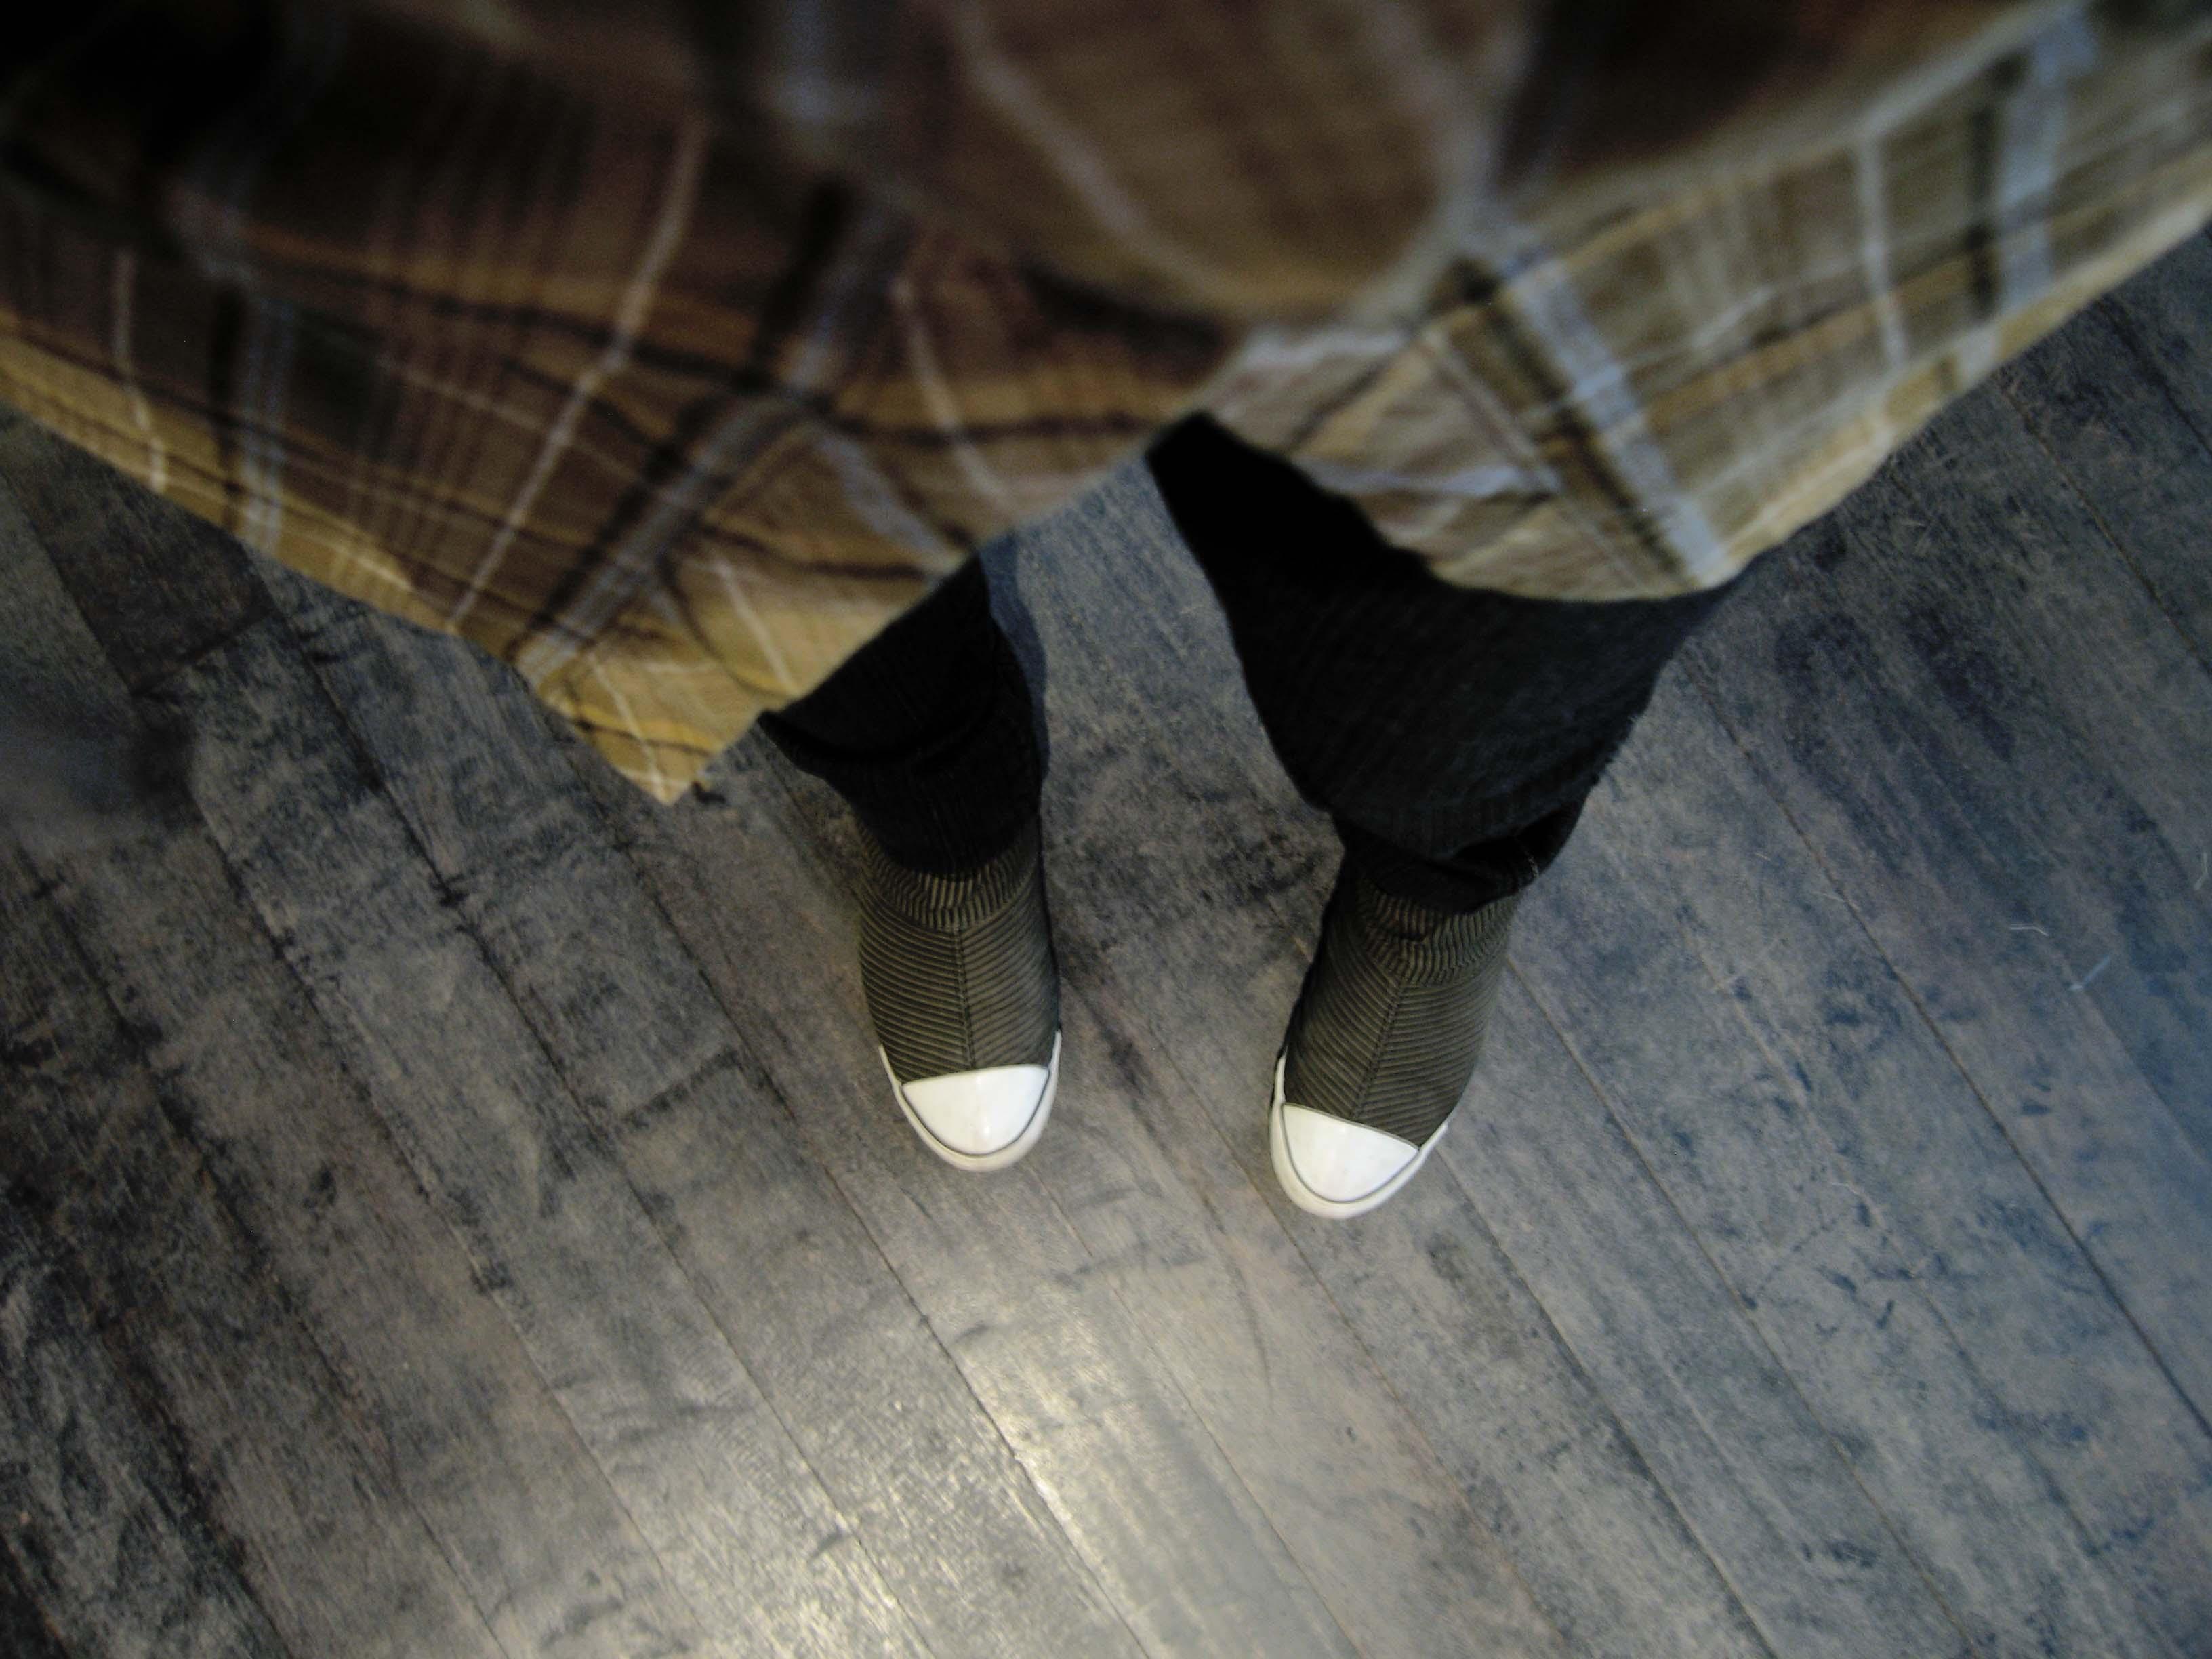 my feet and the floor